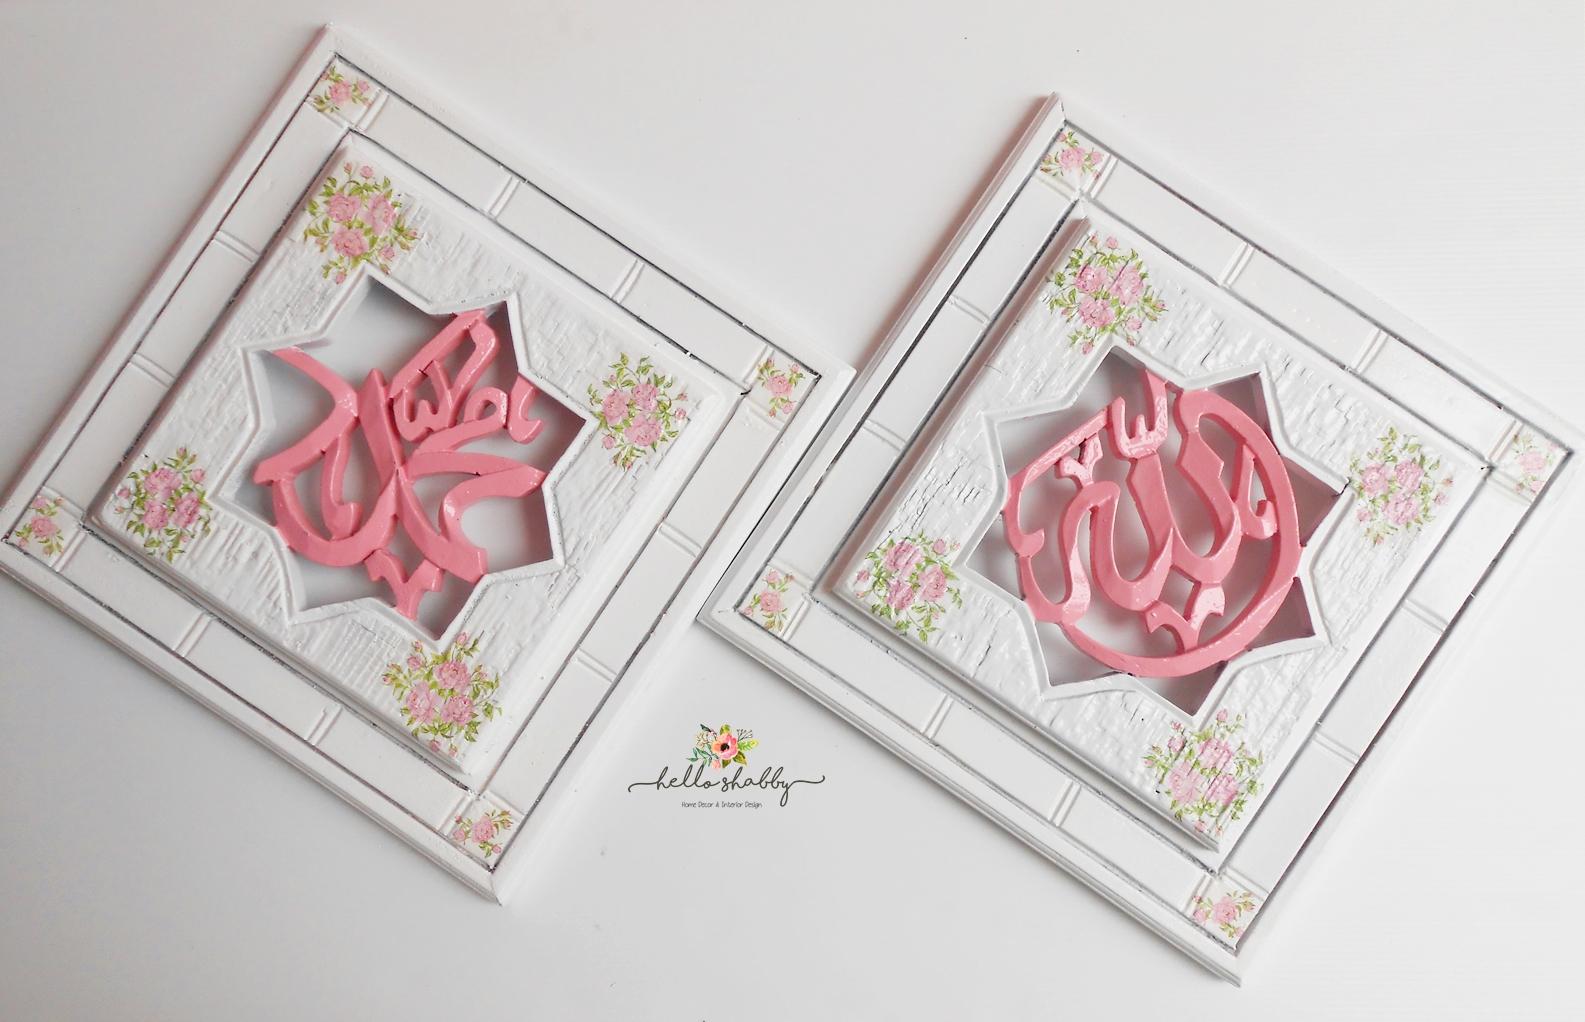 Kaligrafi Ukir Kayu Jati Lafadz Allah Dan Nabi Muhammad Shabby Chic Helloshabby Com Interior And Exterior Solutions